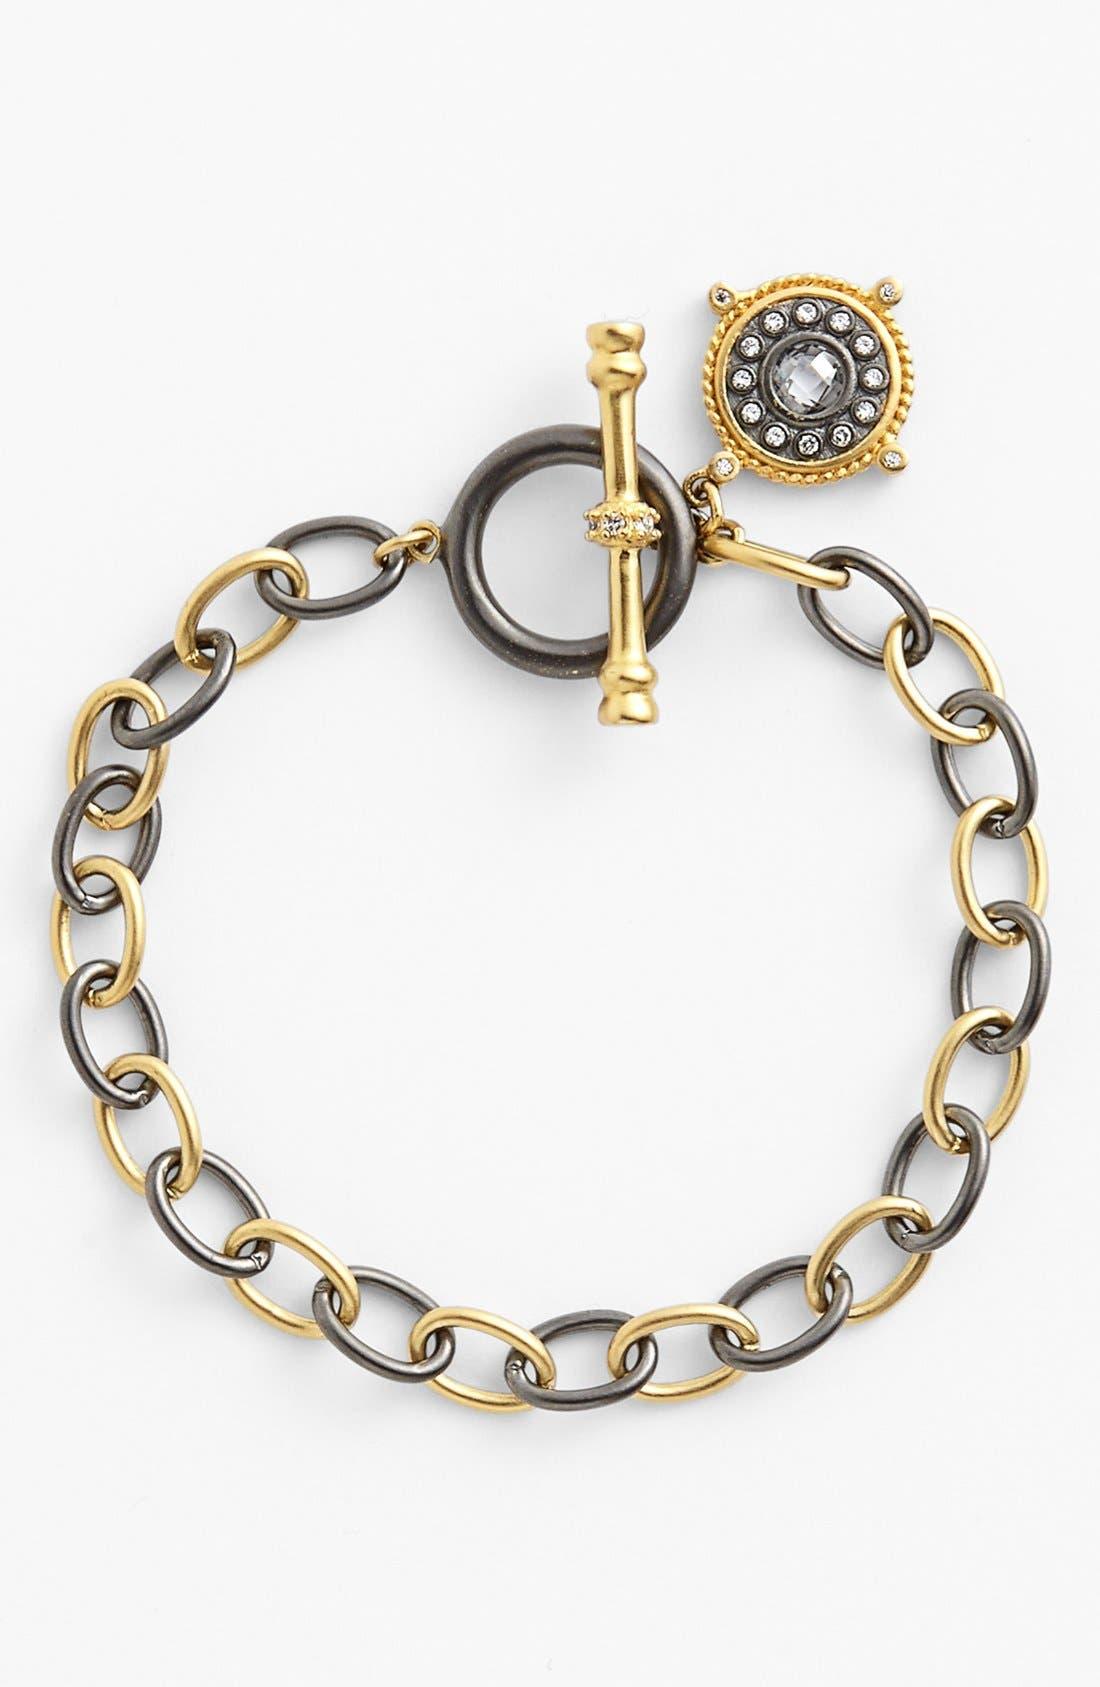 Main Image - FREIDA ROTHMAN 'Hamptons' Nautical Compass Charm Toggle Bracelet